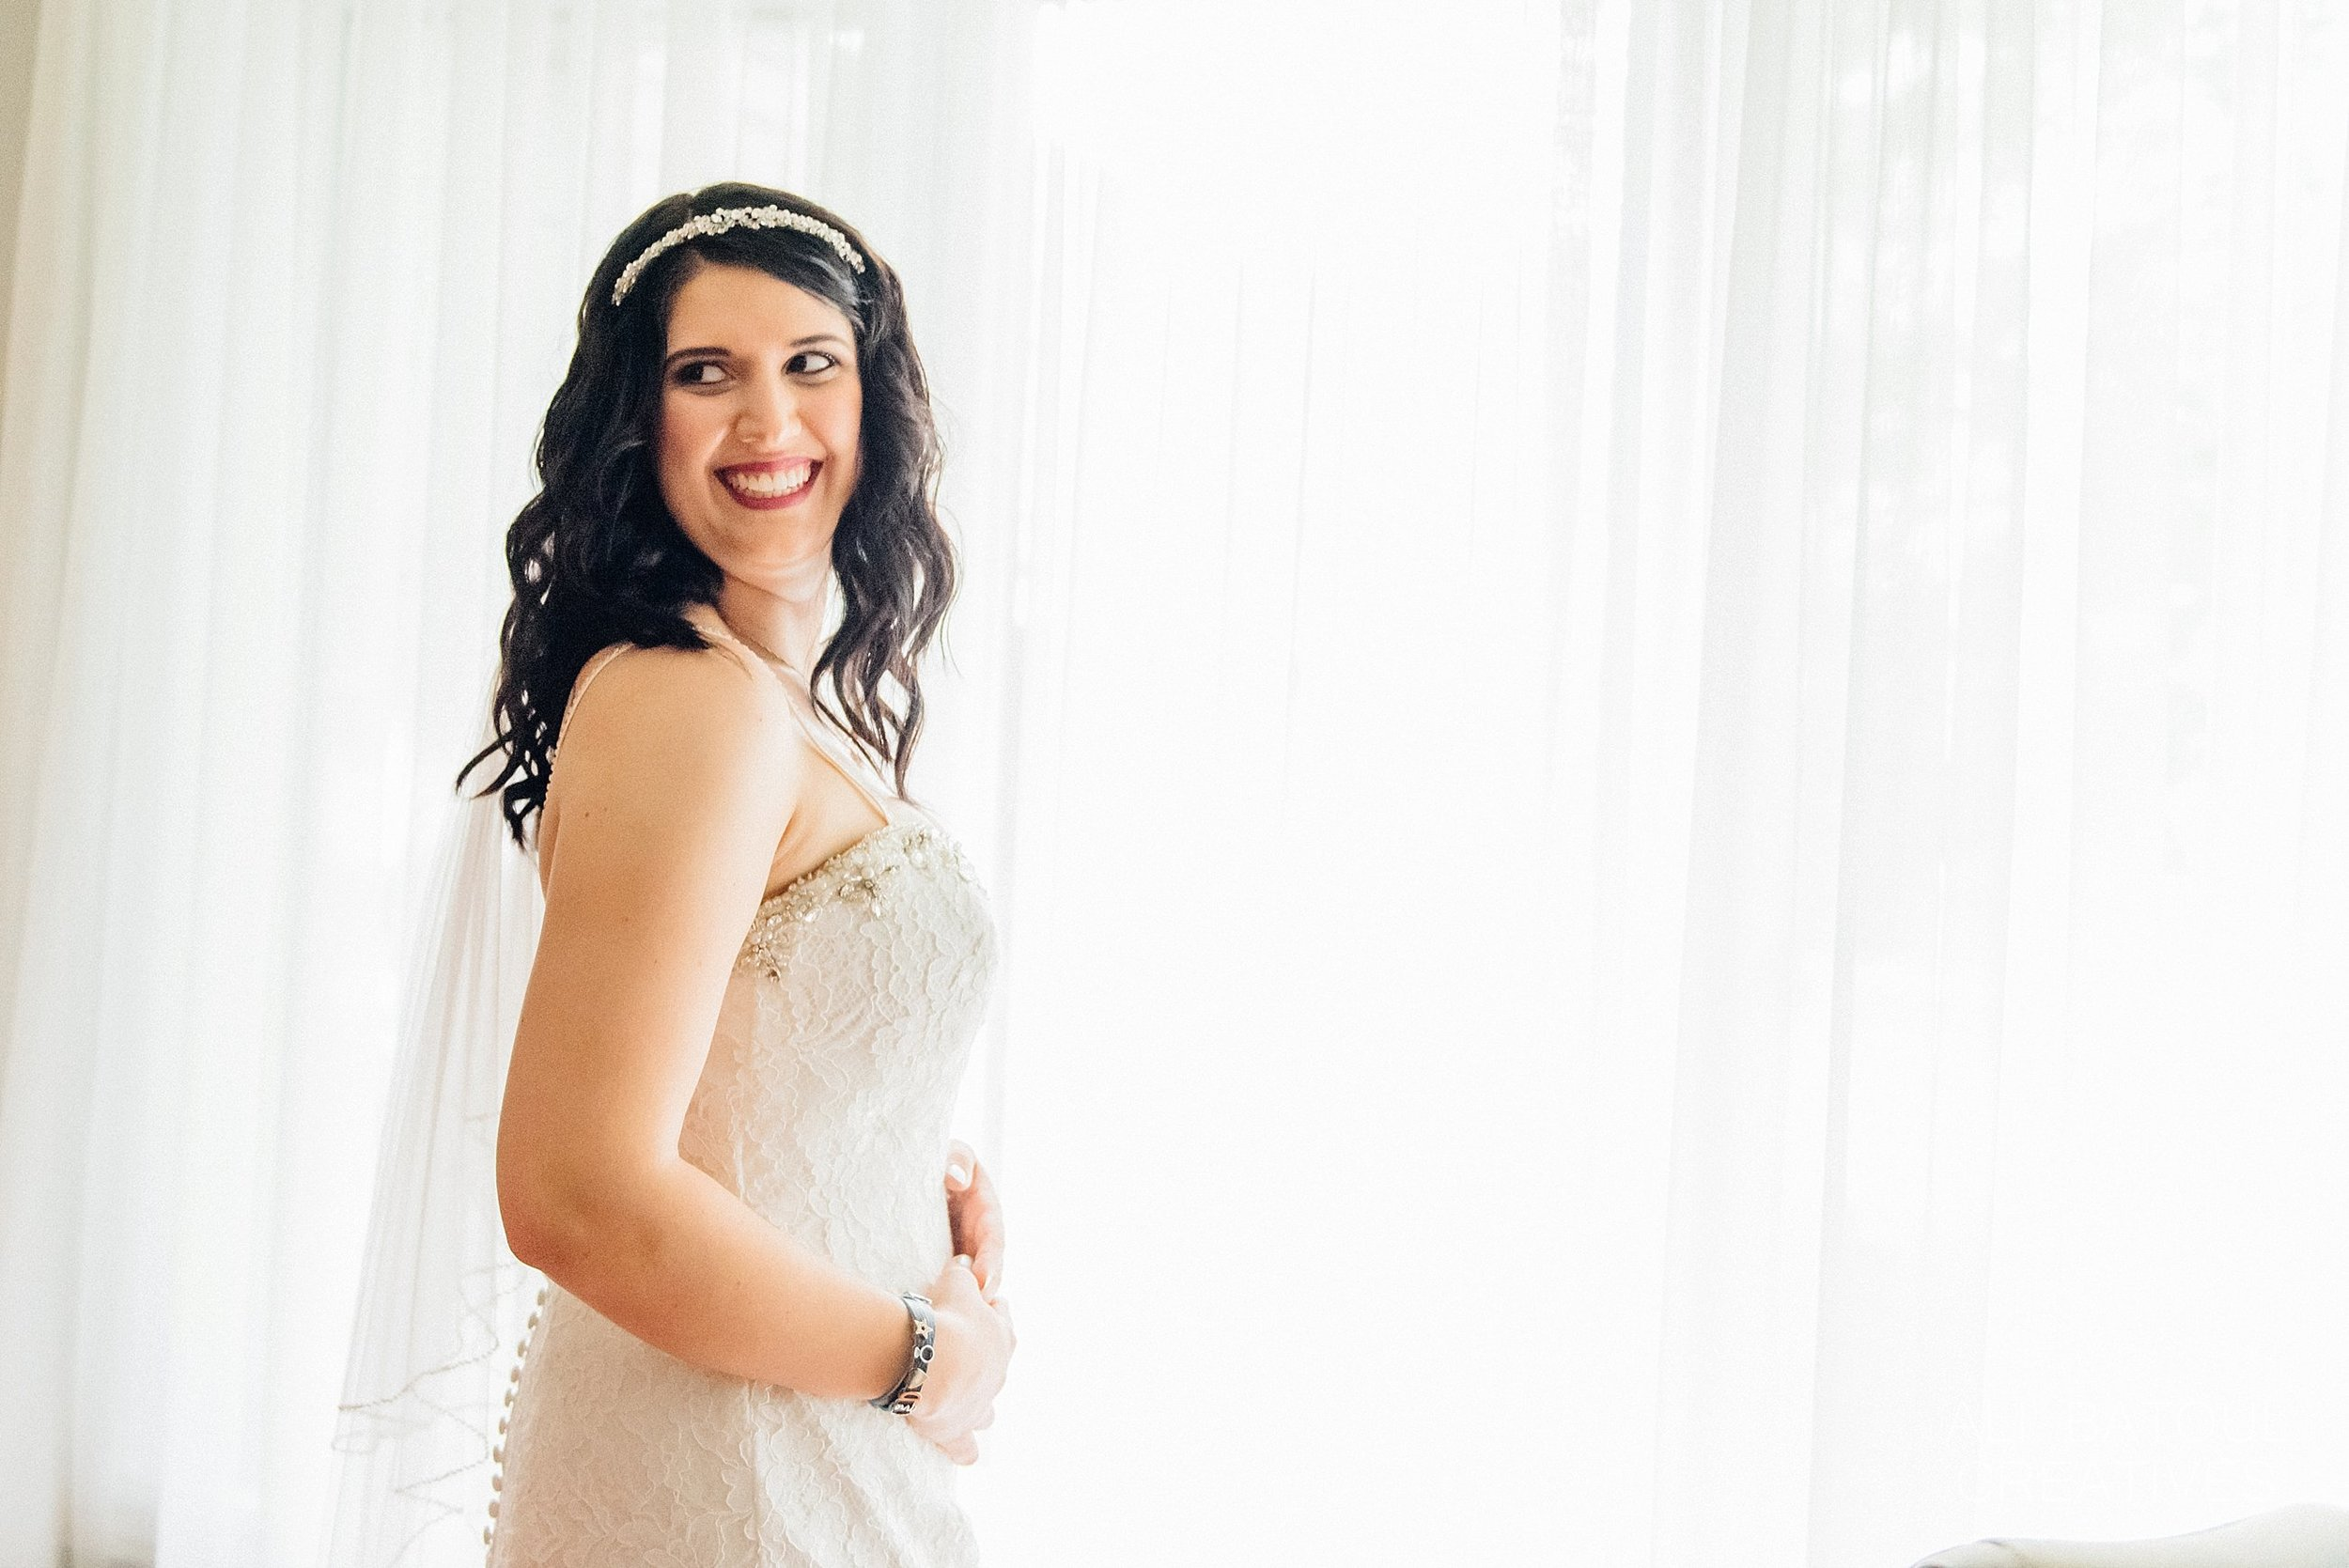 Jocelyn + Steve At The Schoolhouse Wedding - Ali and Batoul Fine Art Wedding Photography_0008.jpg